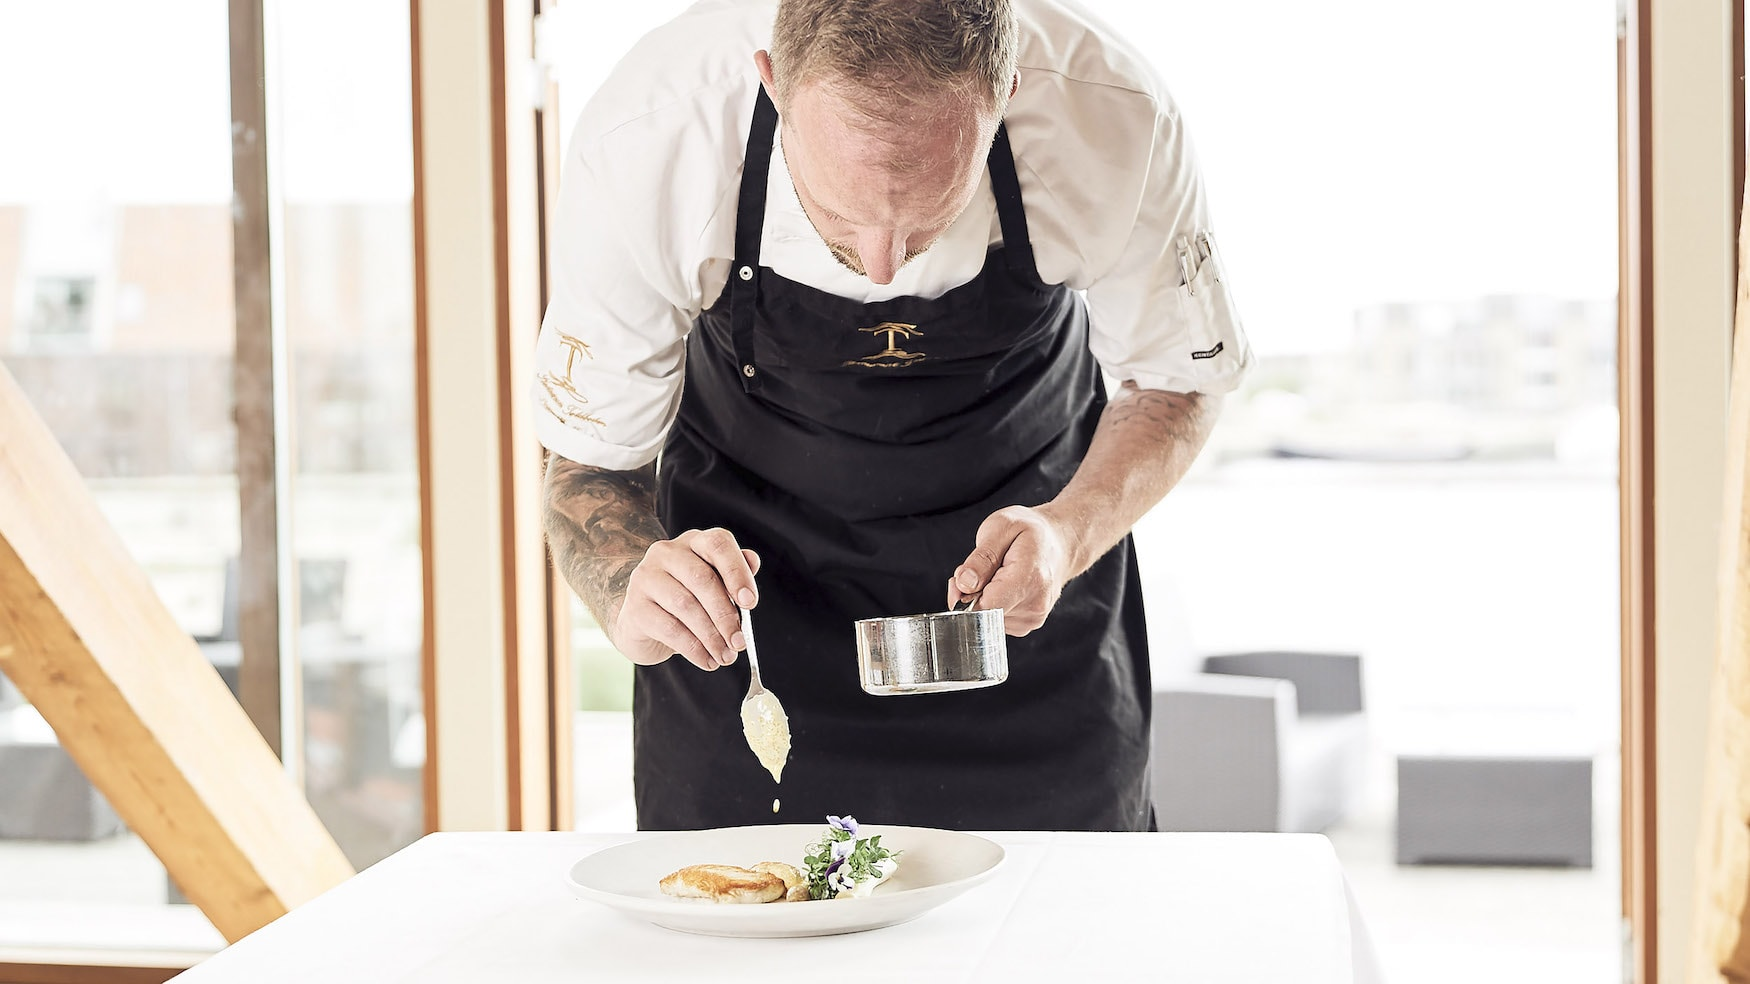 Chefkoch des Restaurants Tolboden richtet einen Teller an.